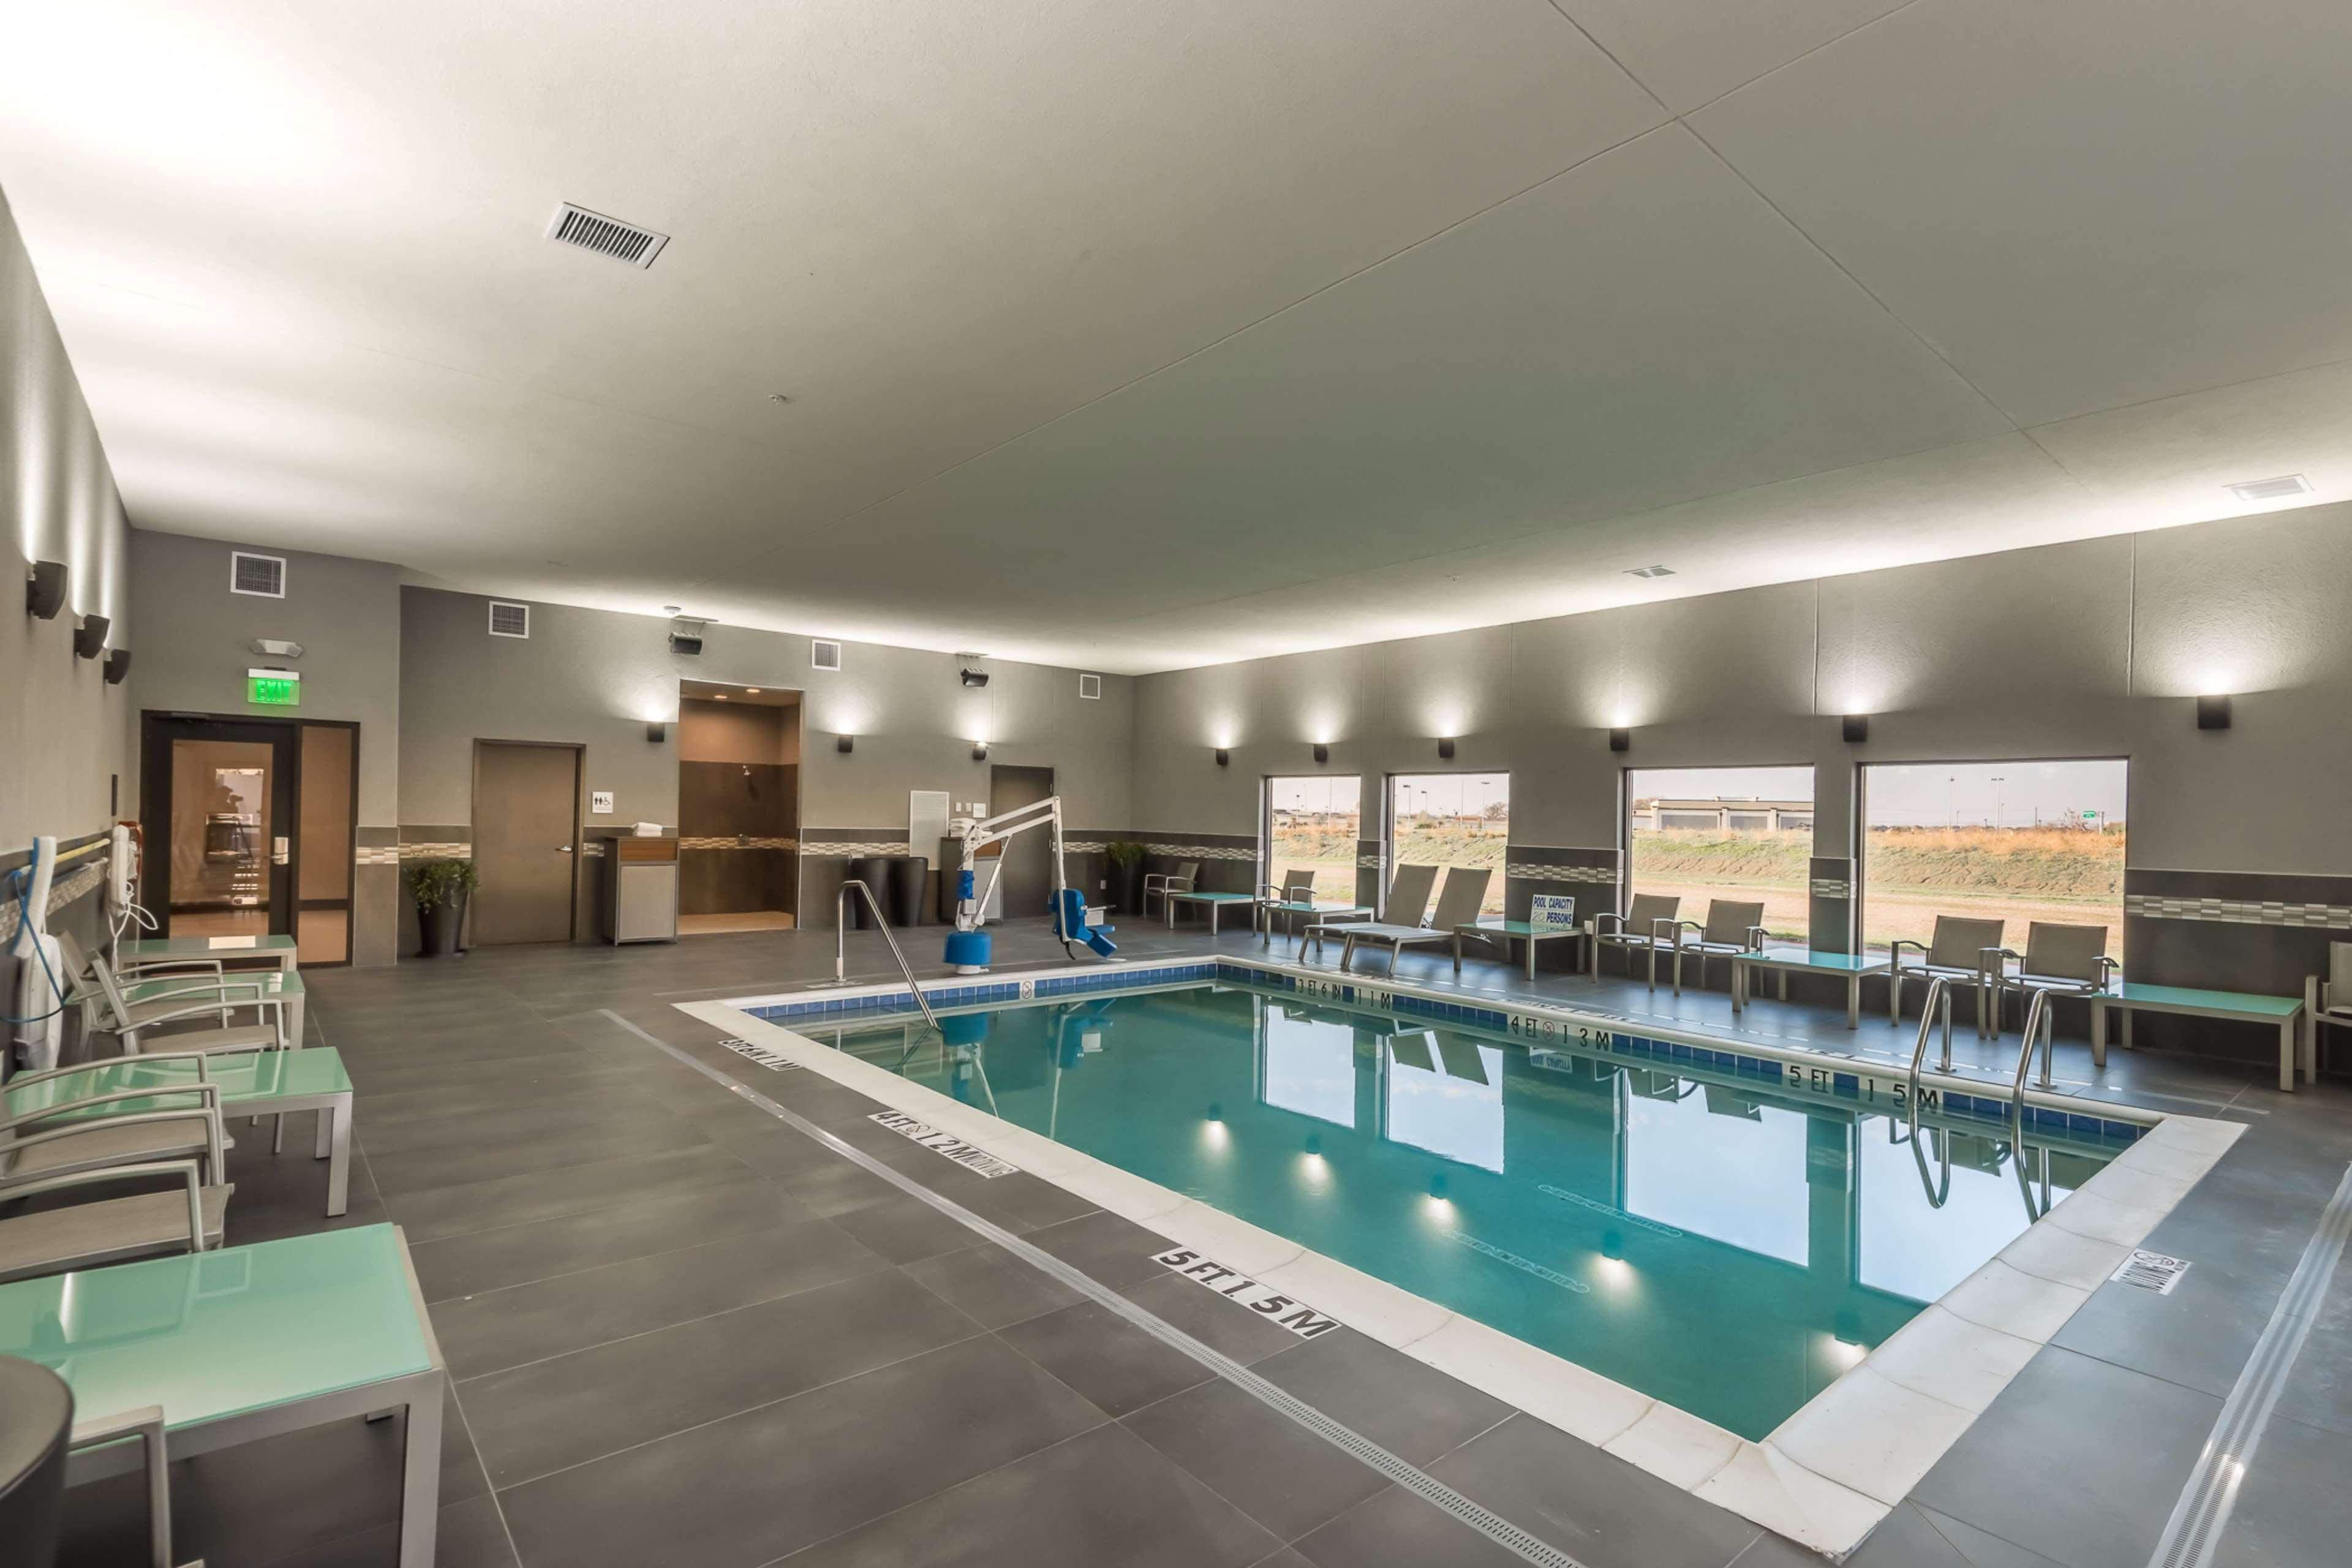 Hampton Inn & Suites Dallas-The Colony, TX image 8